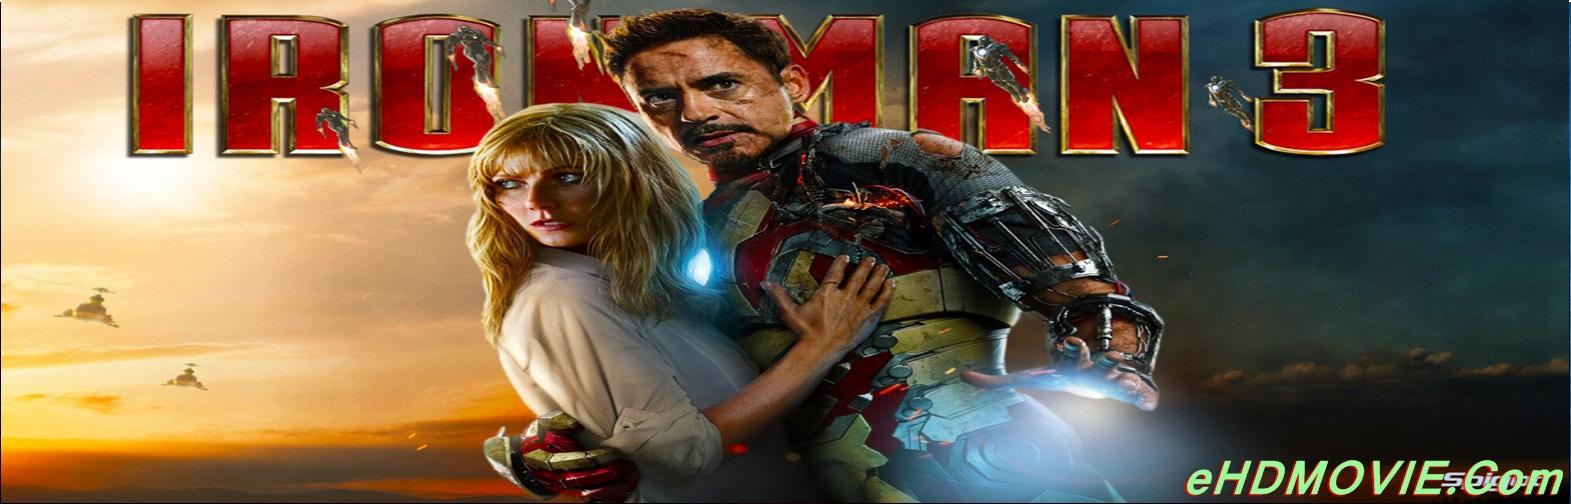 Iron Man 3 2013 Full Movie Dual Audio [Hindi – English] 1080p - 720p - 480p ORG BRRip 400MB - 1GB - 5GB ESubs Free Download